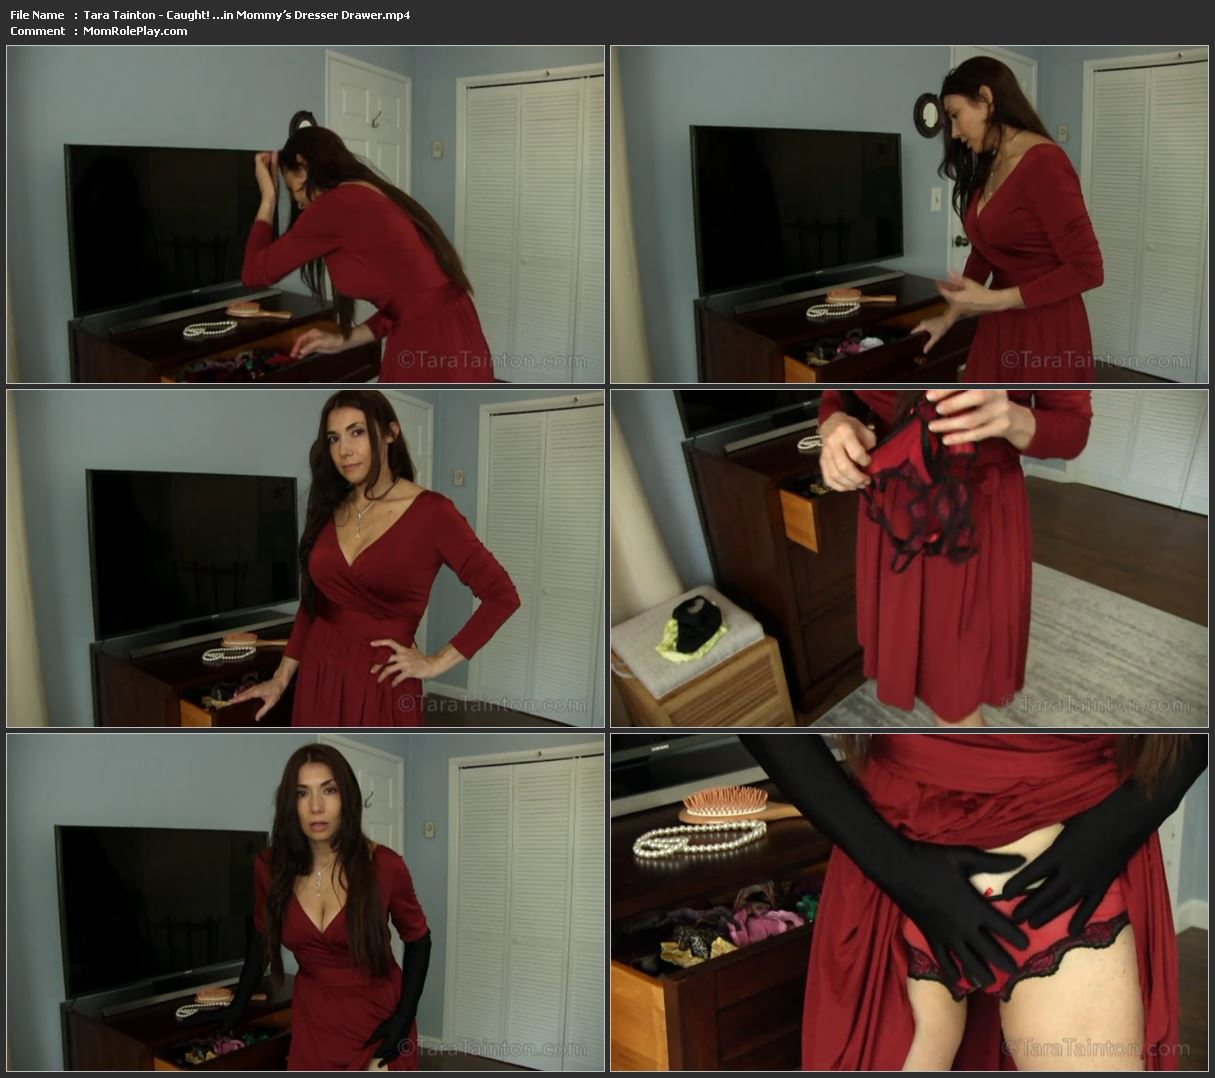 Tara Tainton - Caught! …in Mommy's Dresser Drawer